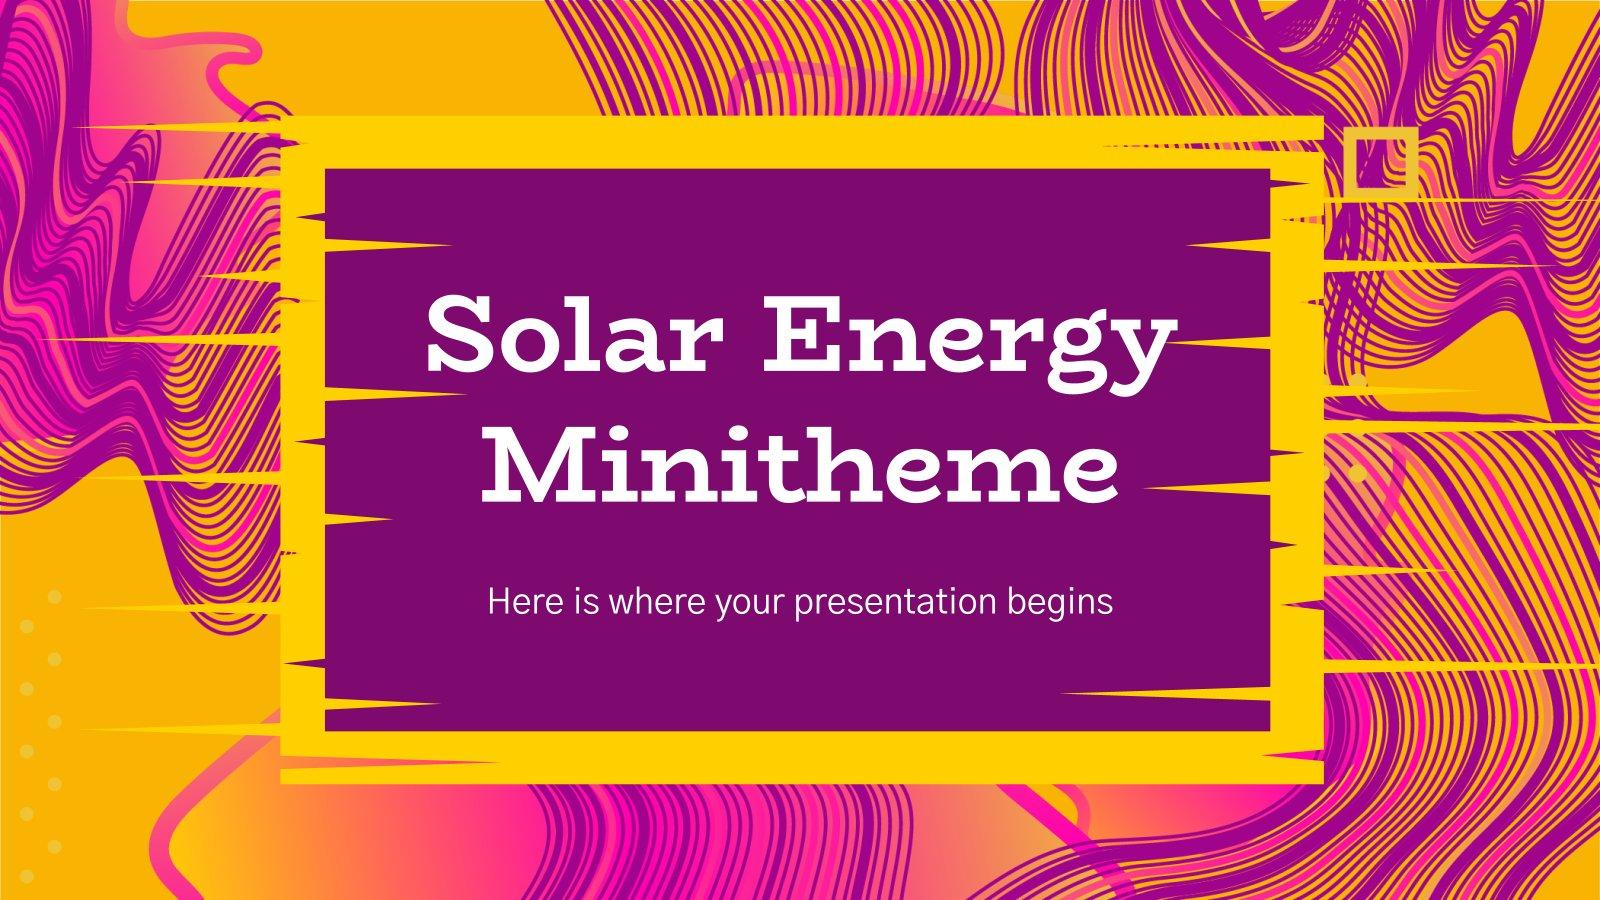 Solar Energy Minitheme presentation template